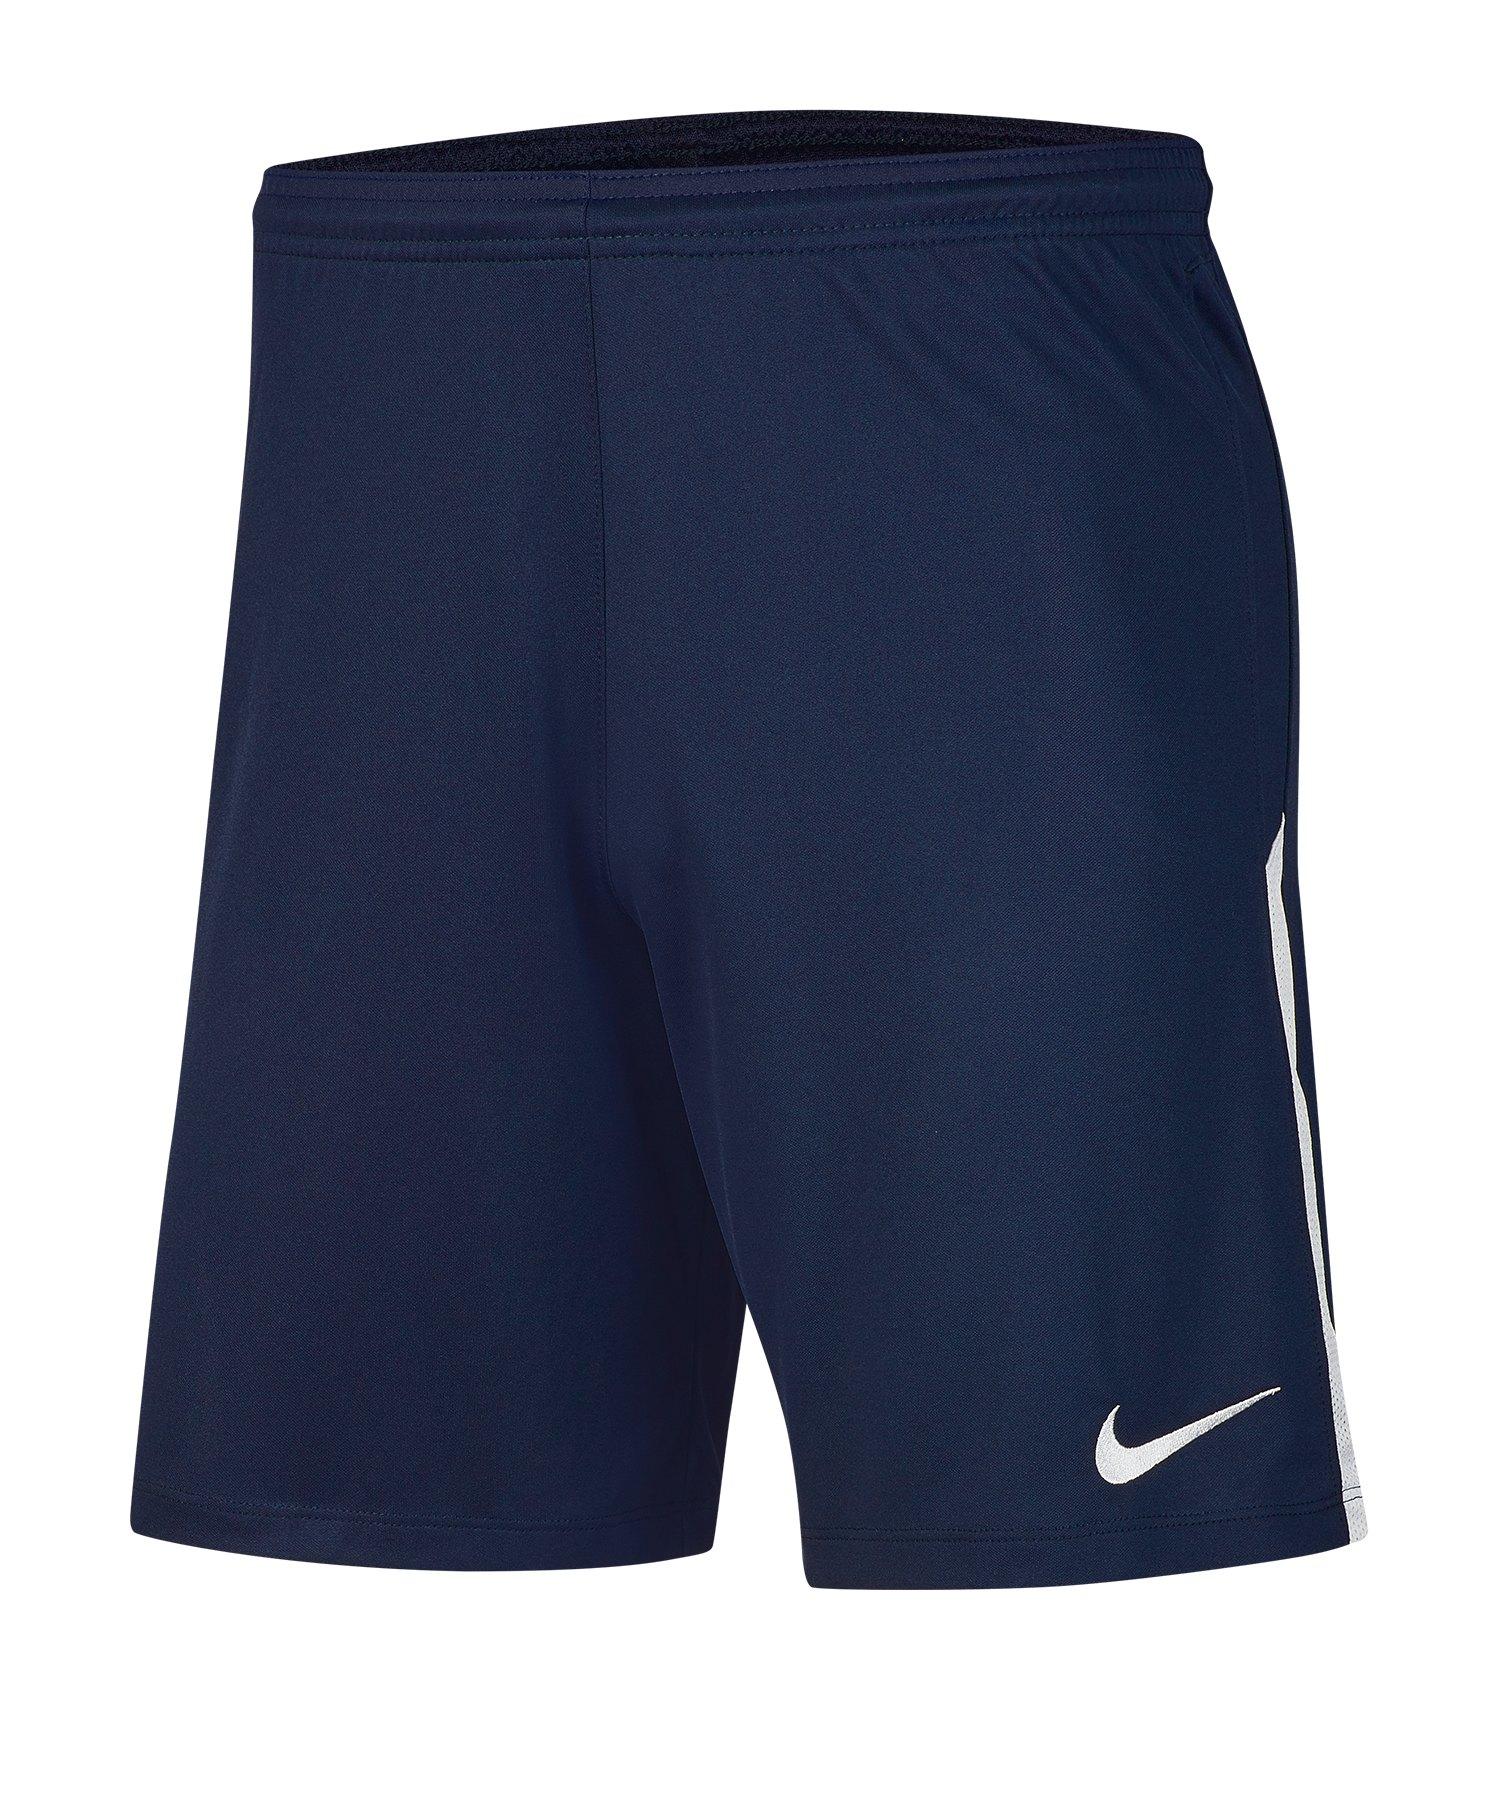 Nike League Knit II Short Kids Blau F410 - blau